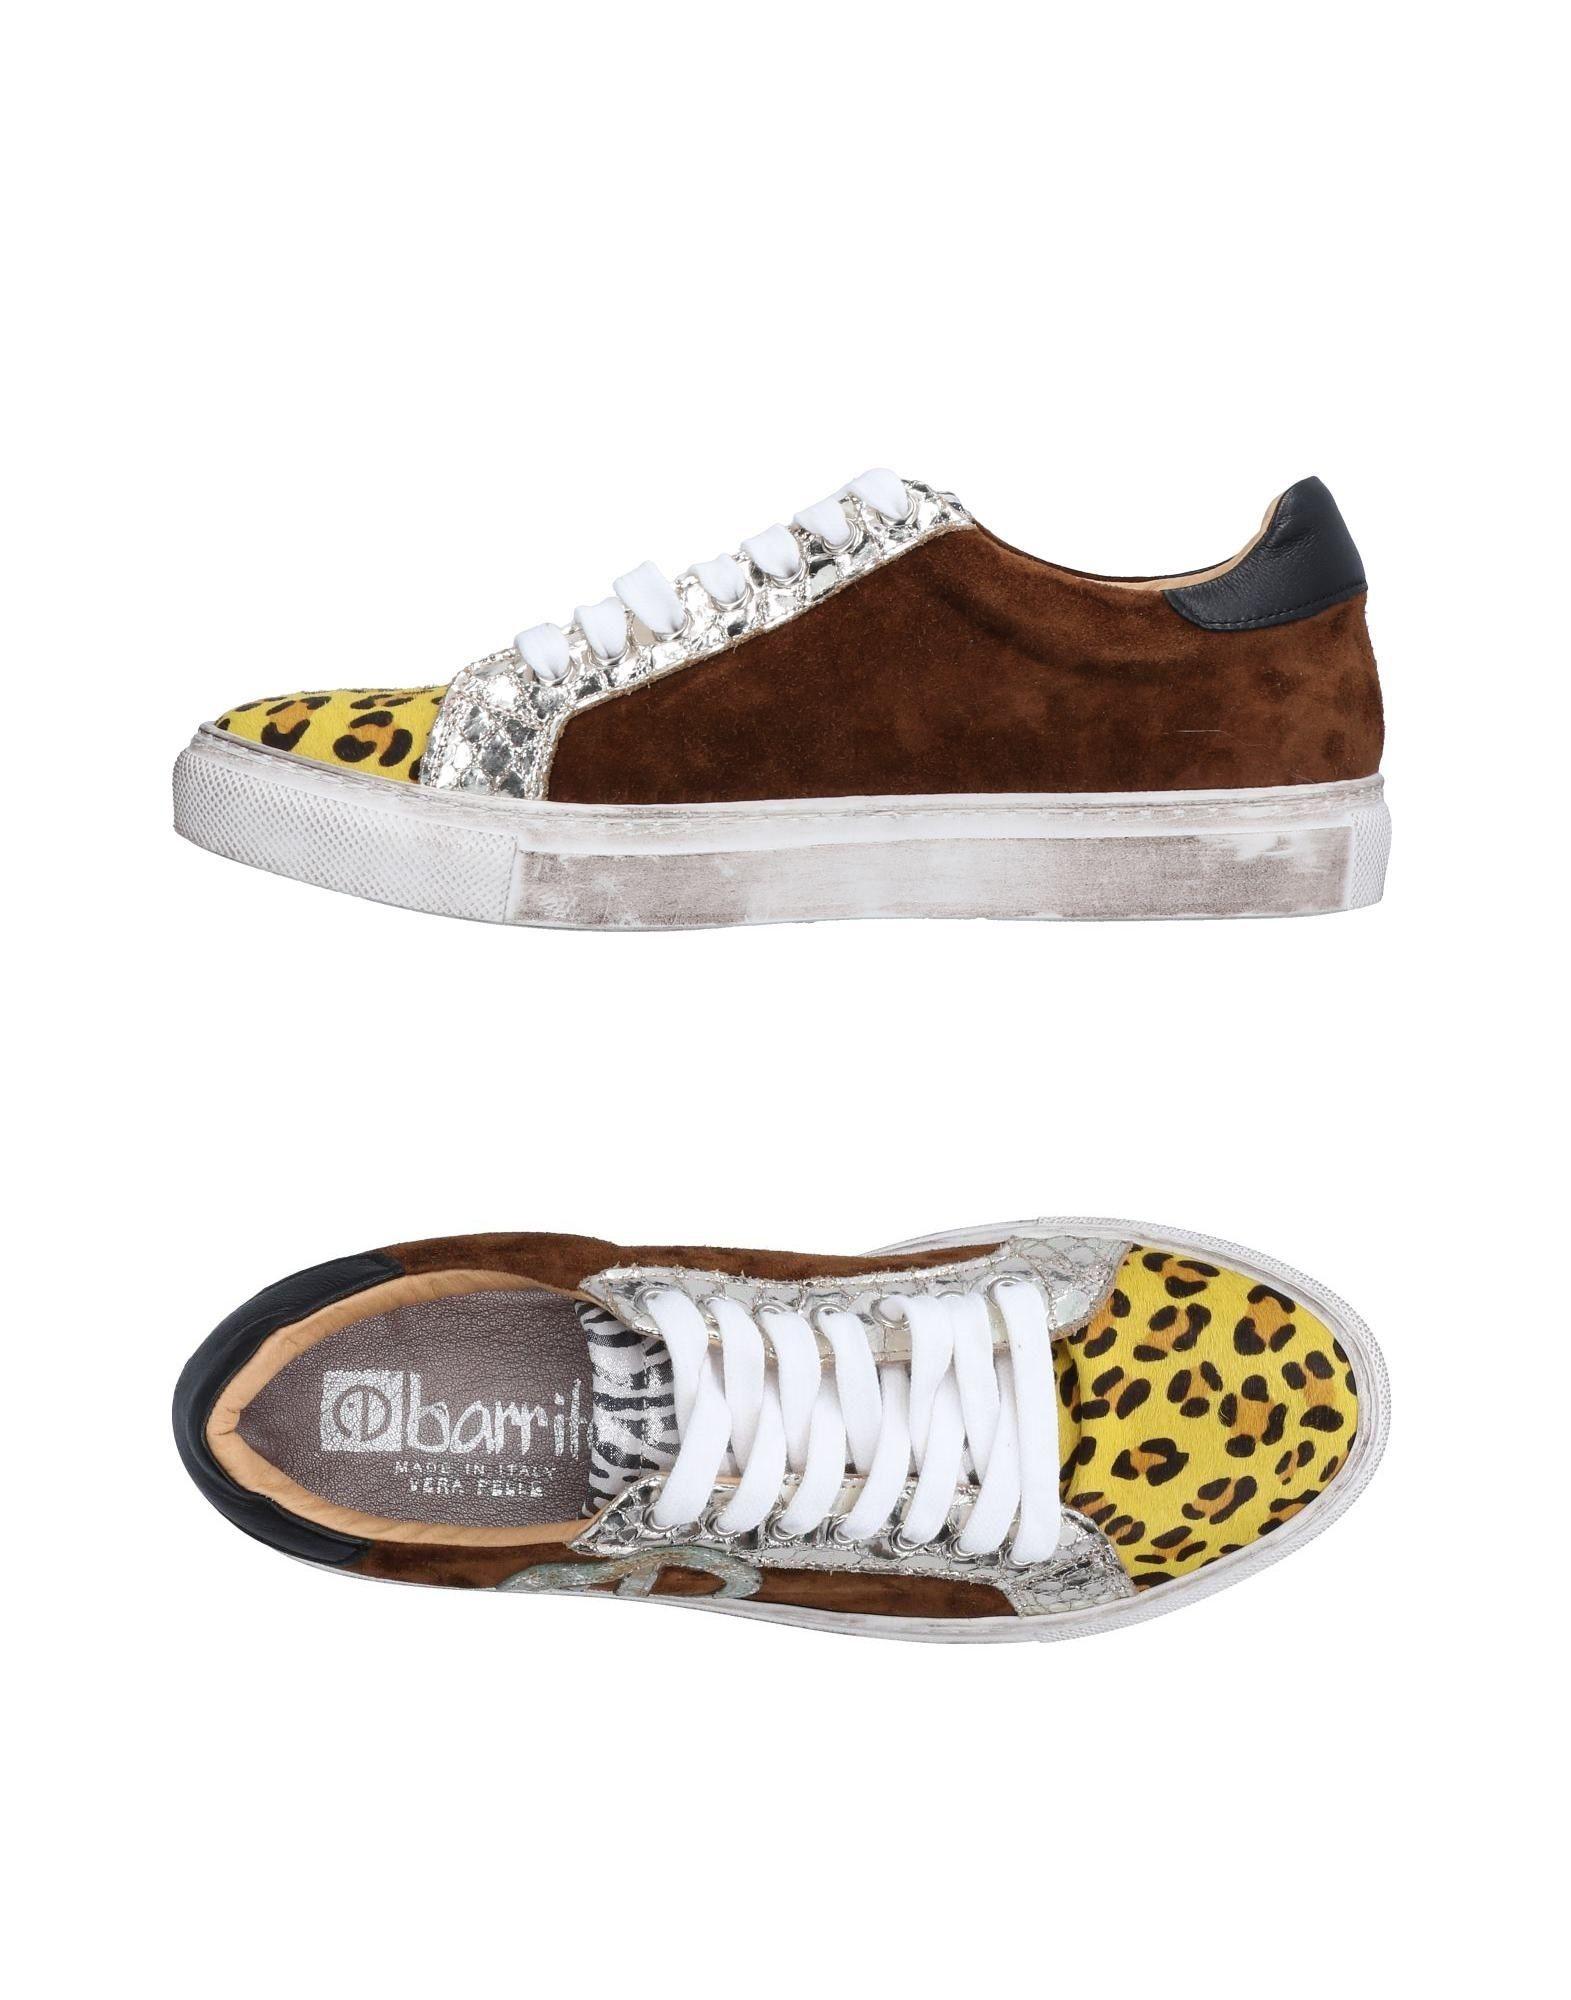 Ebarrito Sneakers Damen  11521191CL 11521191CL 11521191CL Gute Qualität beliebte Schuhe 4c1dab